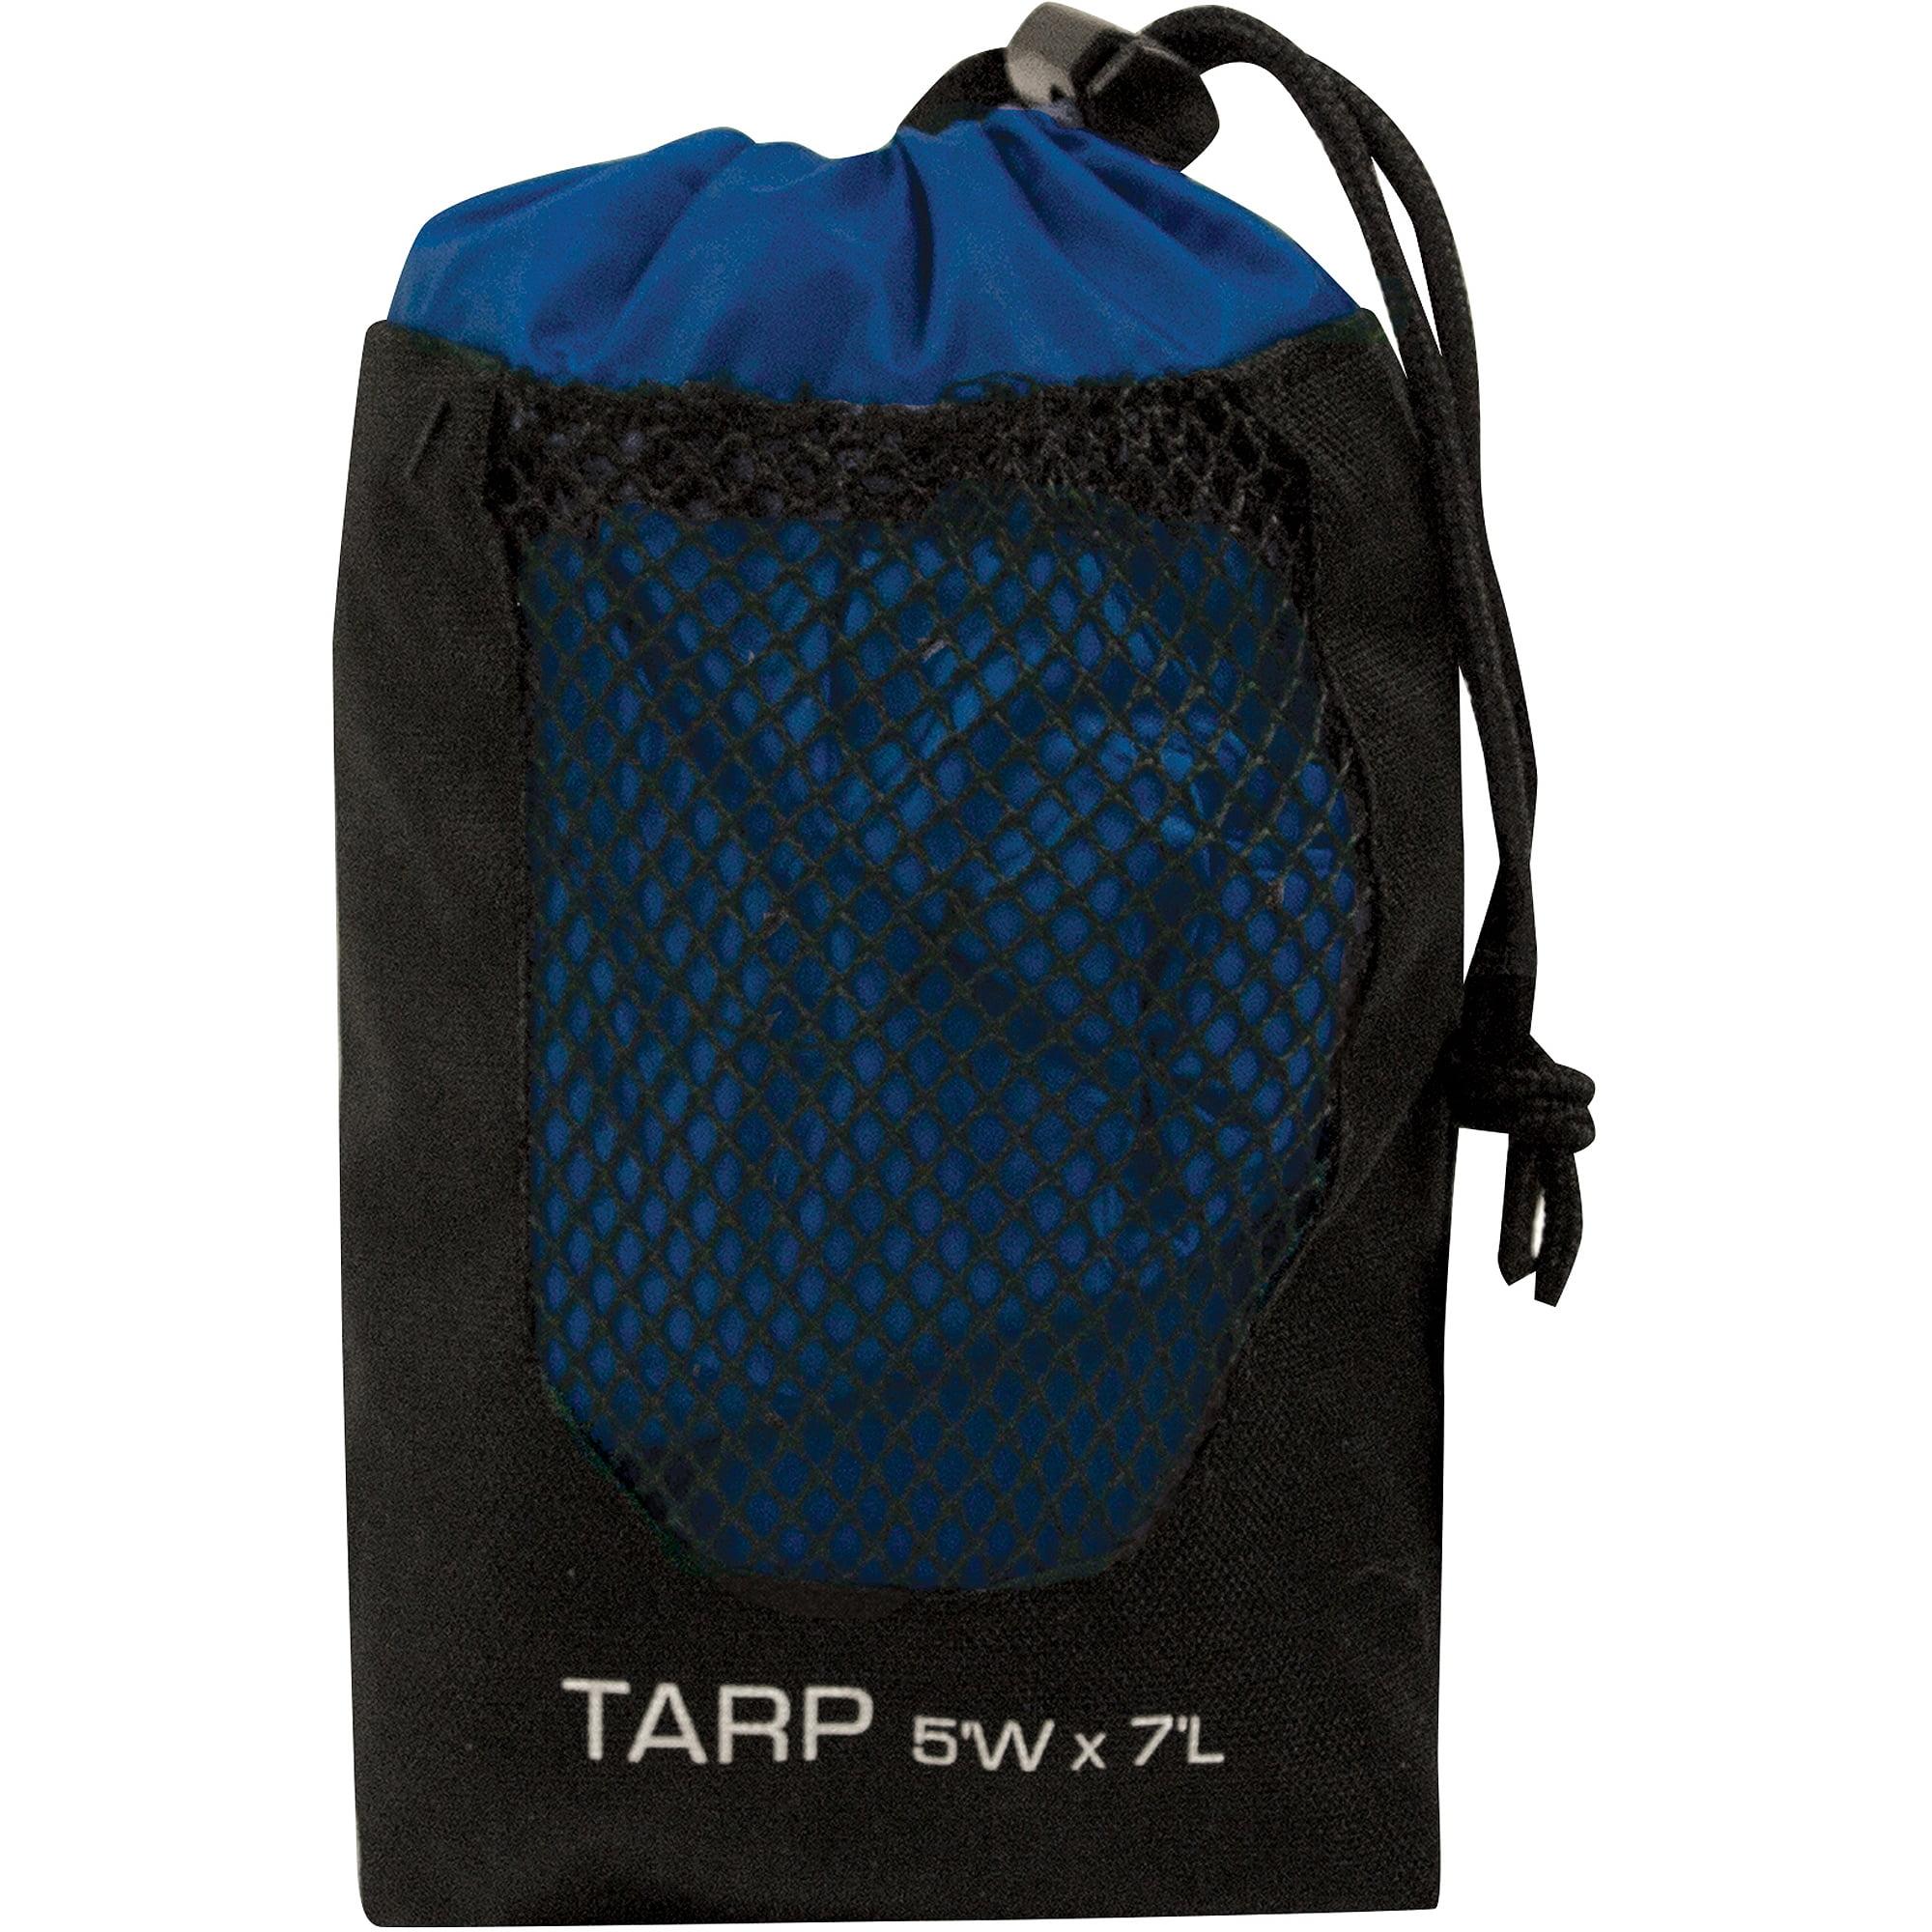 sc 1 st  Walmart & Outdoor Products Backpackeru0027s Tarp Blue - Walmart.com